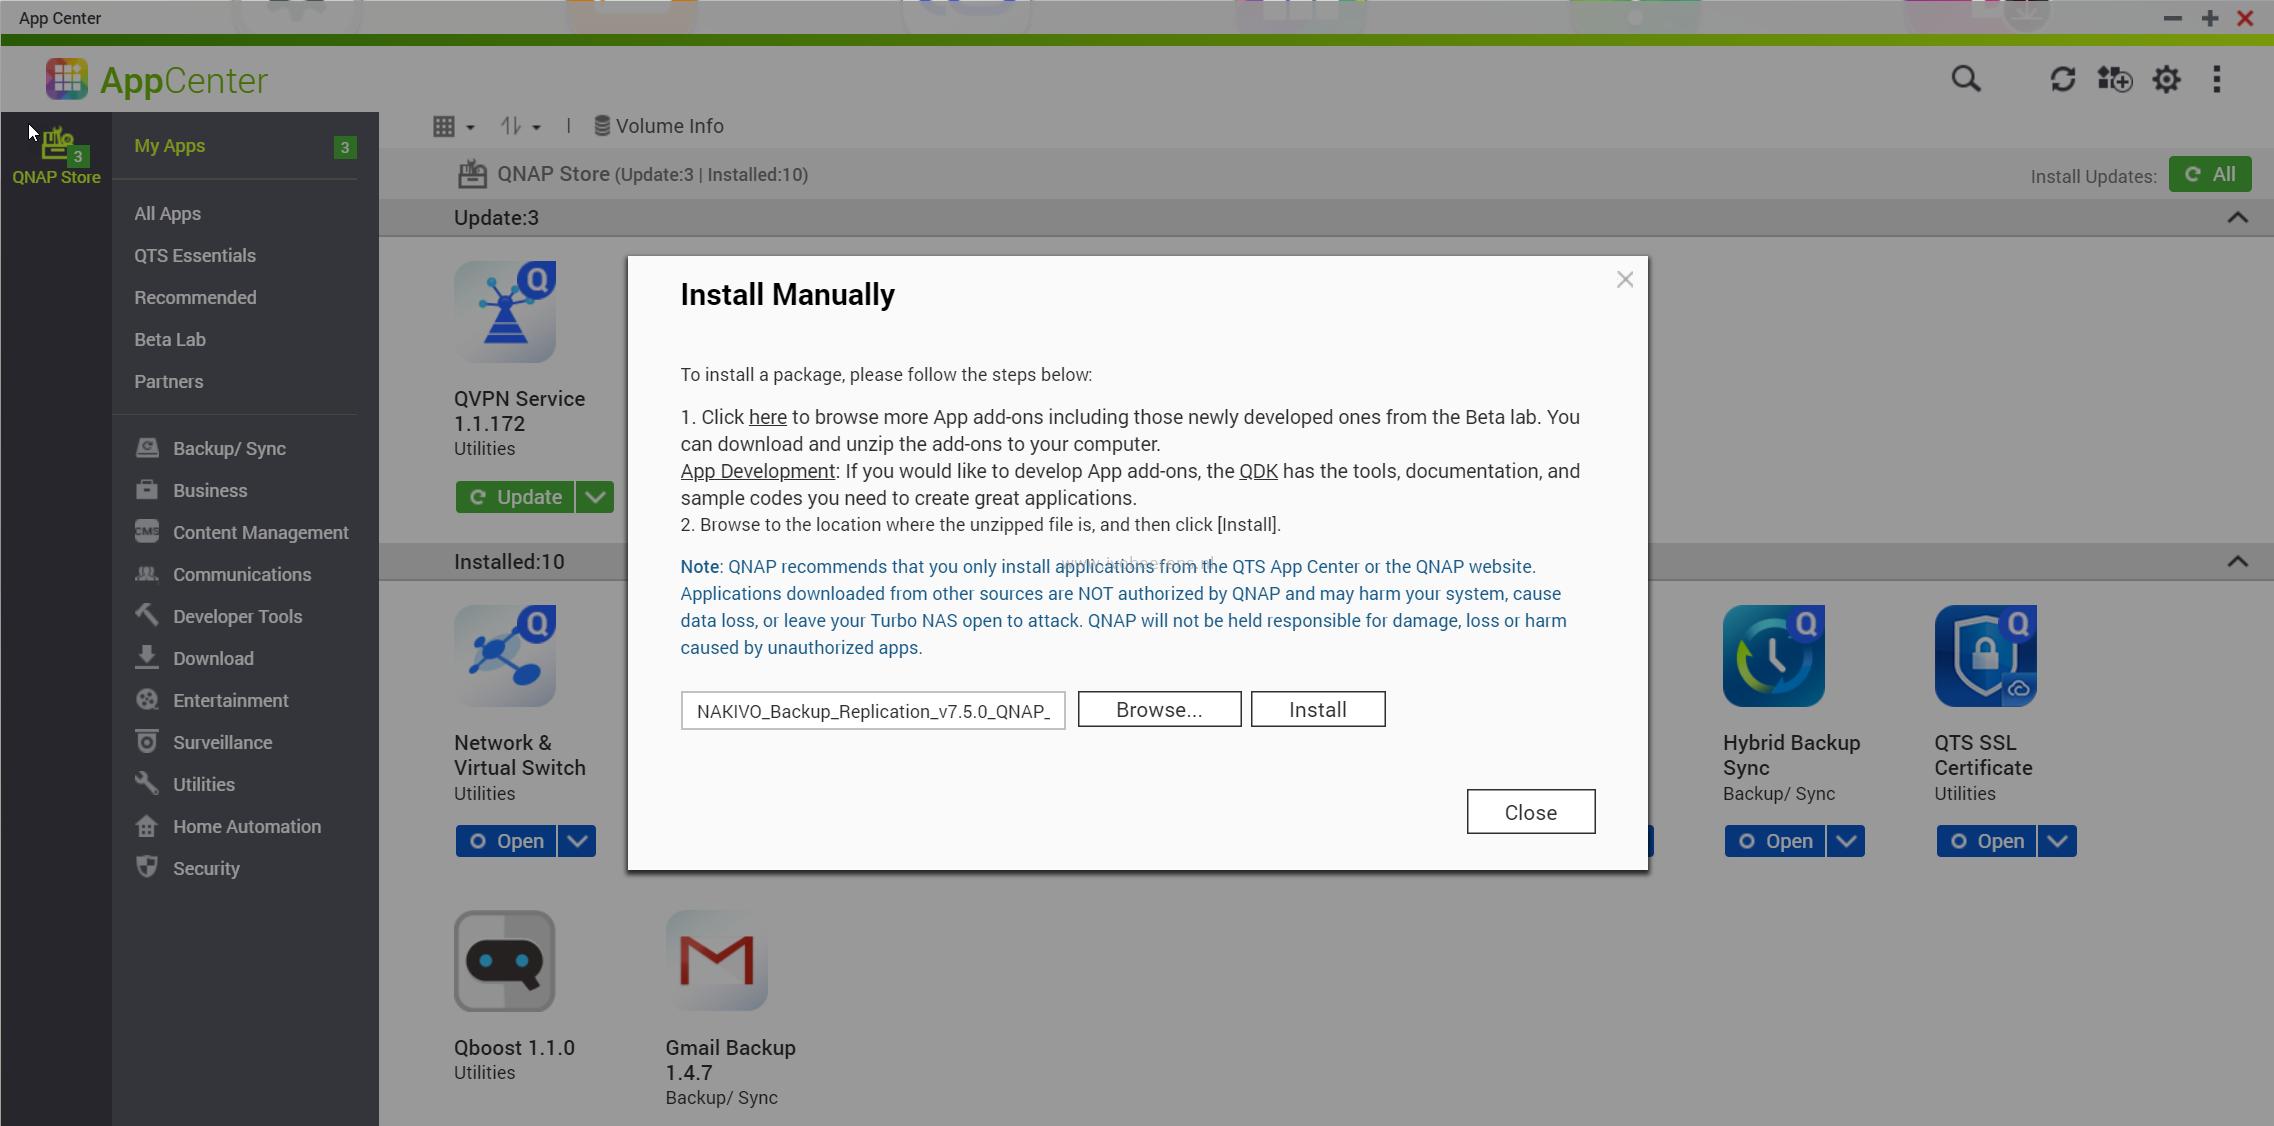 Review NAKIVO Backup & Replication v7 5 - Installation